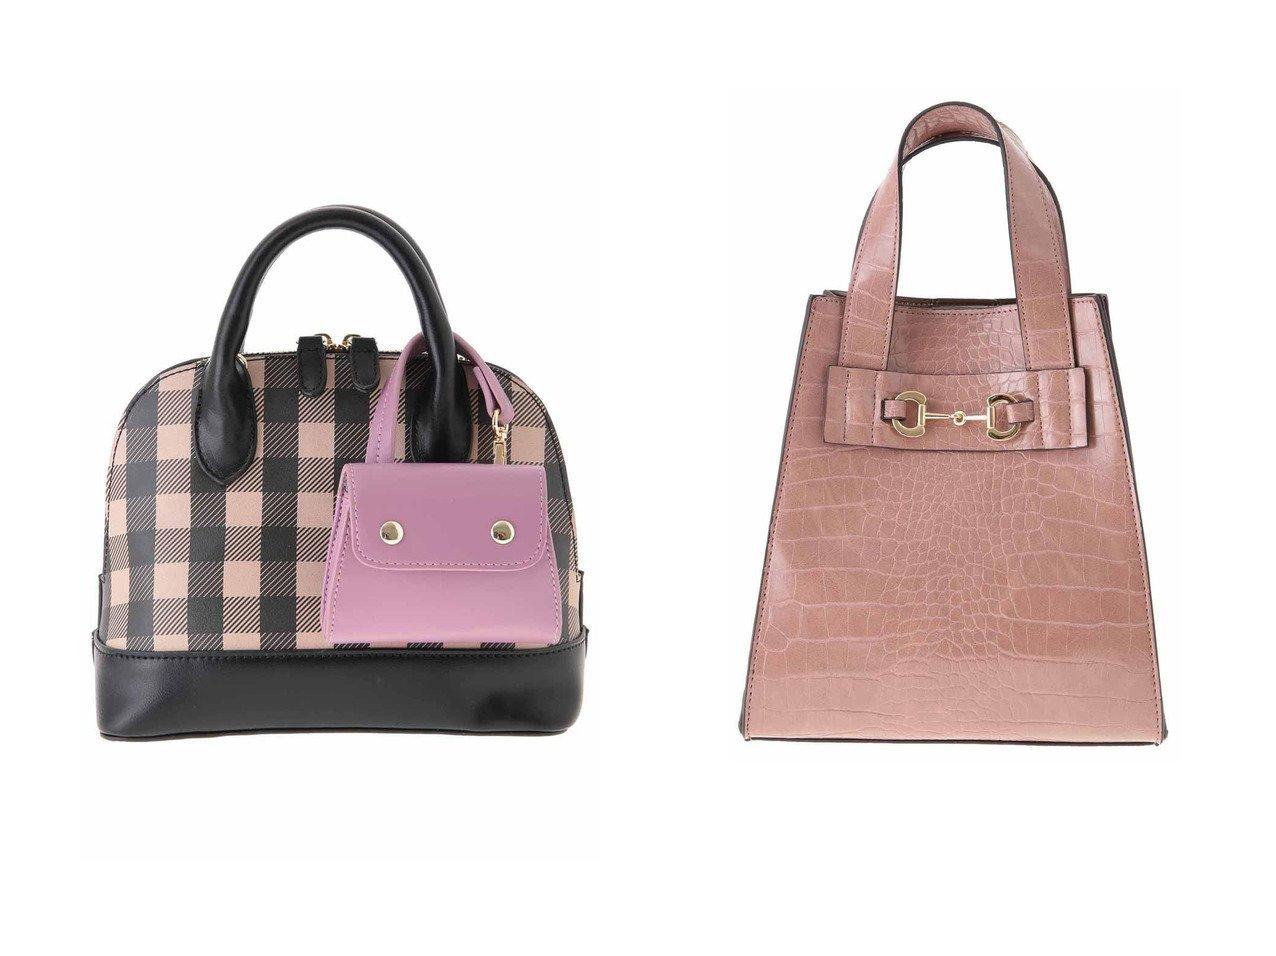 【31 Sons de mode/トランテアン ソン ドゥ モード】のクロコ×スウェード配色バッグ&チェックミニショルダー 【バッグ・鞄】おすすめ!人気、トレンド・レディースファッションの通販 おすすめで人気の流行・トレンド、ファッションの通販商品 インテリア・家具・メンズファッション・キッズファッション・レディースファッション・服の通販 founy(ファニー) https://founy.com/ ファッション Fashion レディースファッション WOMEN バッグ Bag クロコ スウェード フェイクスウェード 台形 ギンガム チェック チャーム ボストン ボストンバッグ  ID:crp329100000055429